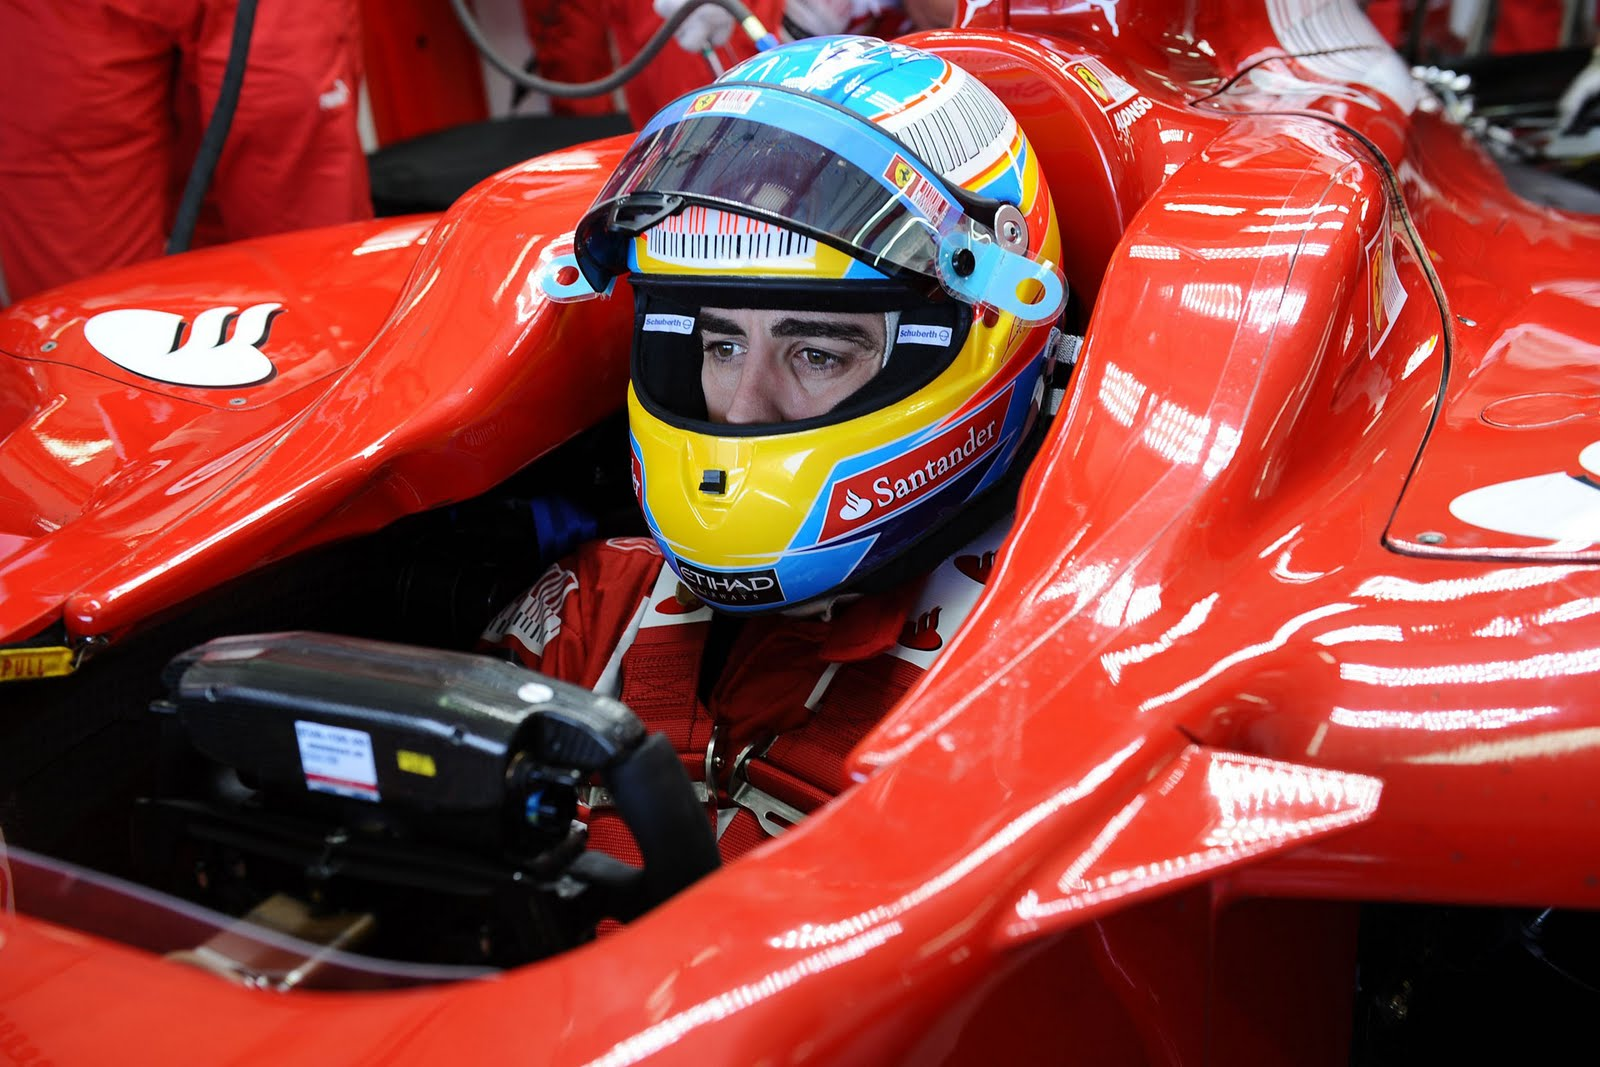 Fotos de Fernando Alonso Fotos e Imgenes en FOTOBLOG X 1600x1067